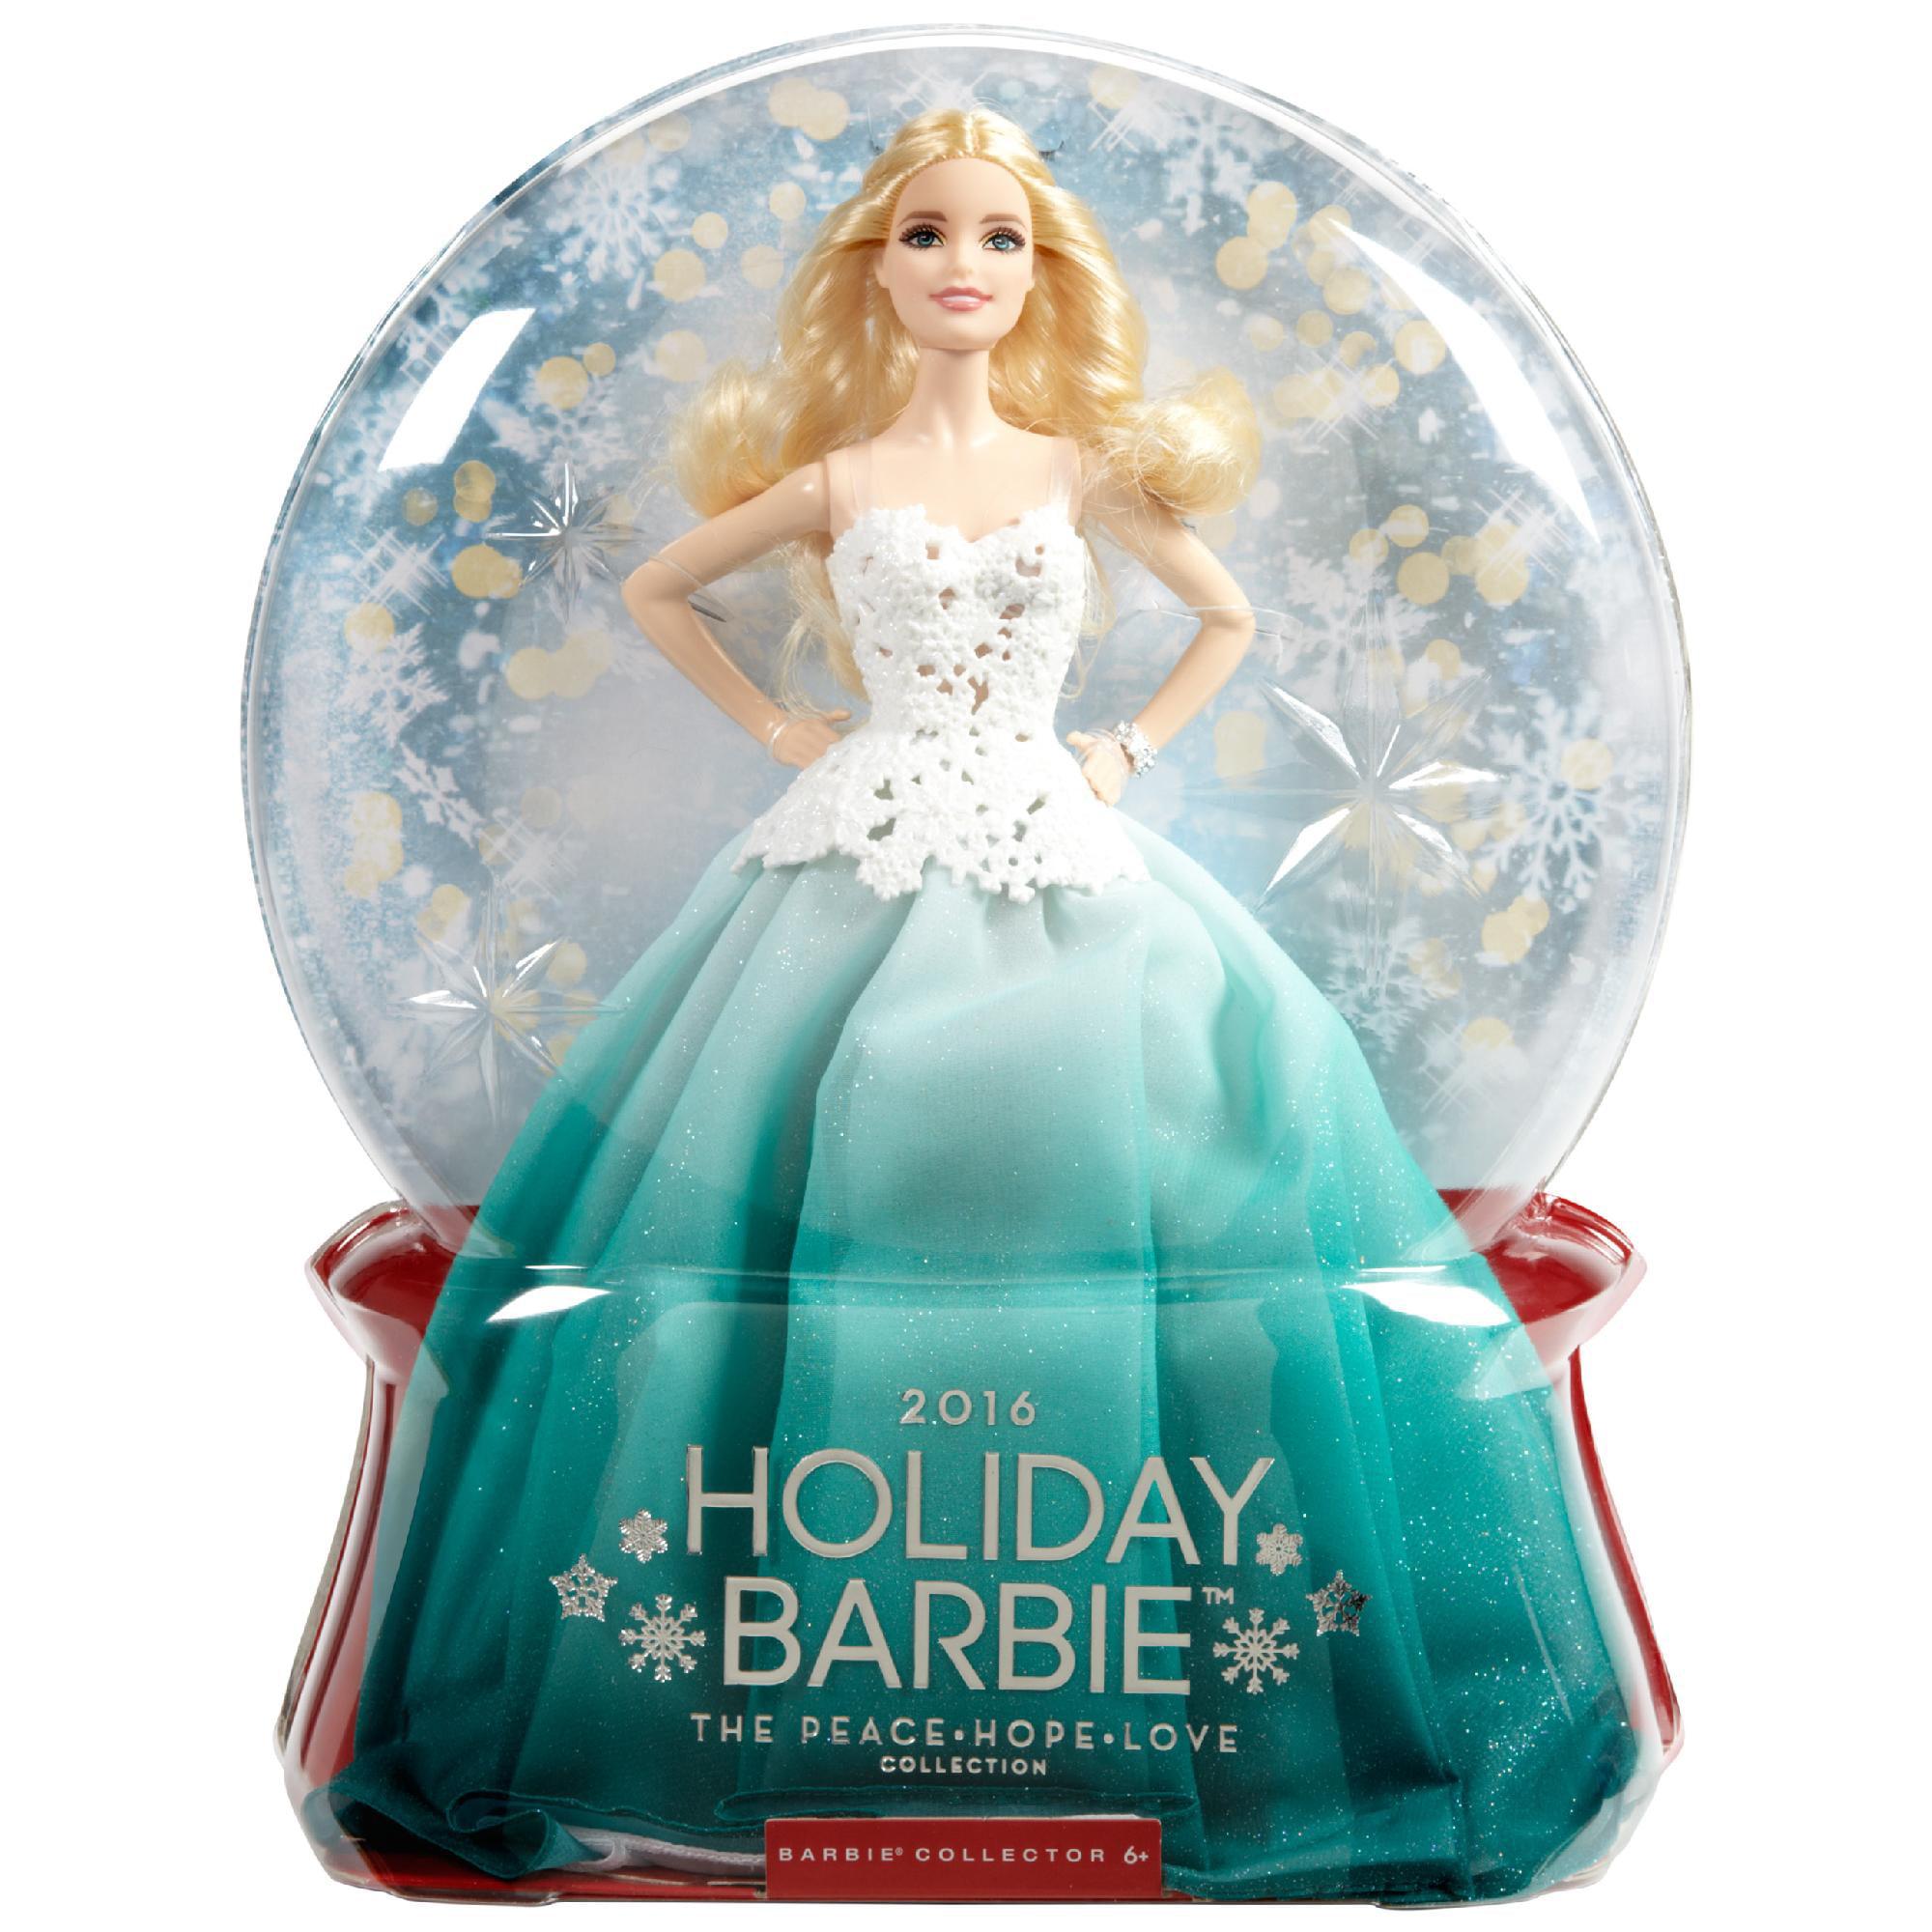 2016 Holiday Barbie Doll - Walmart.com